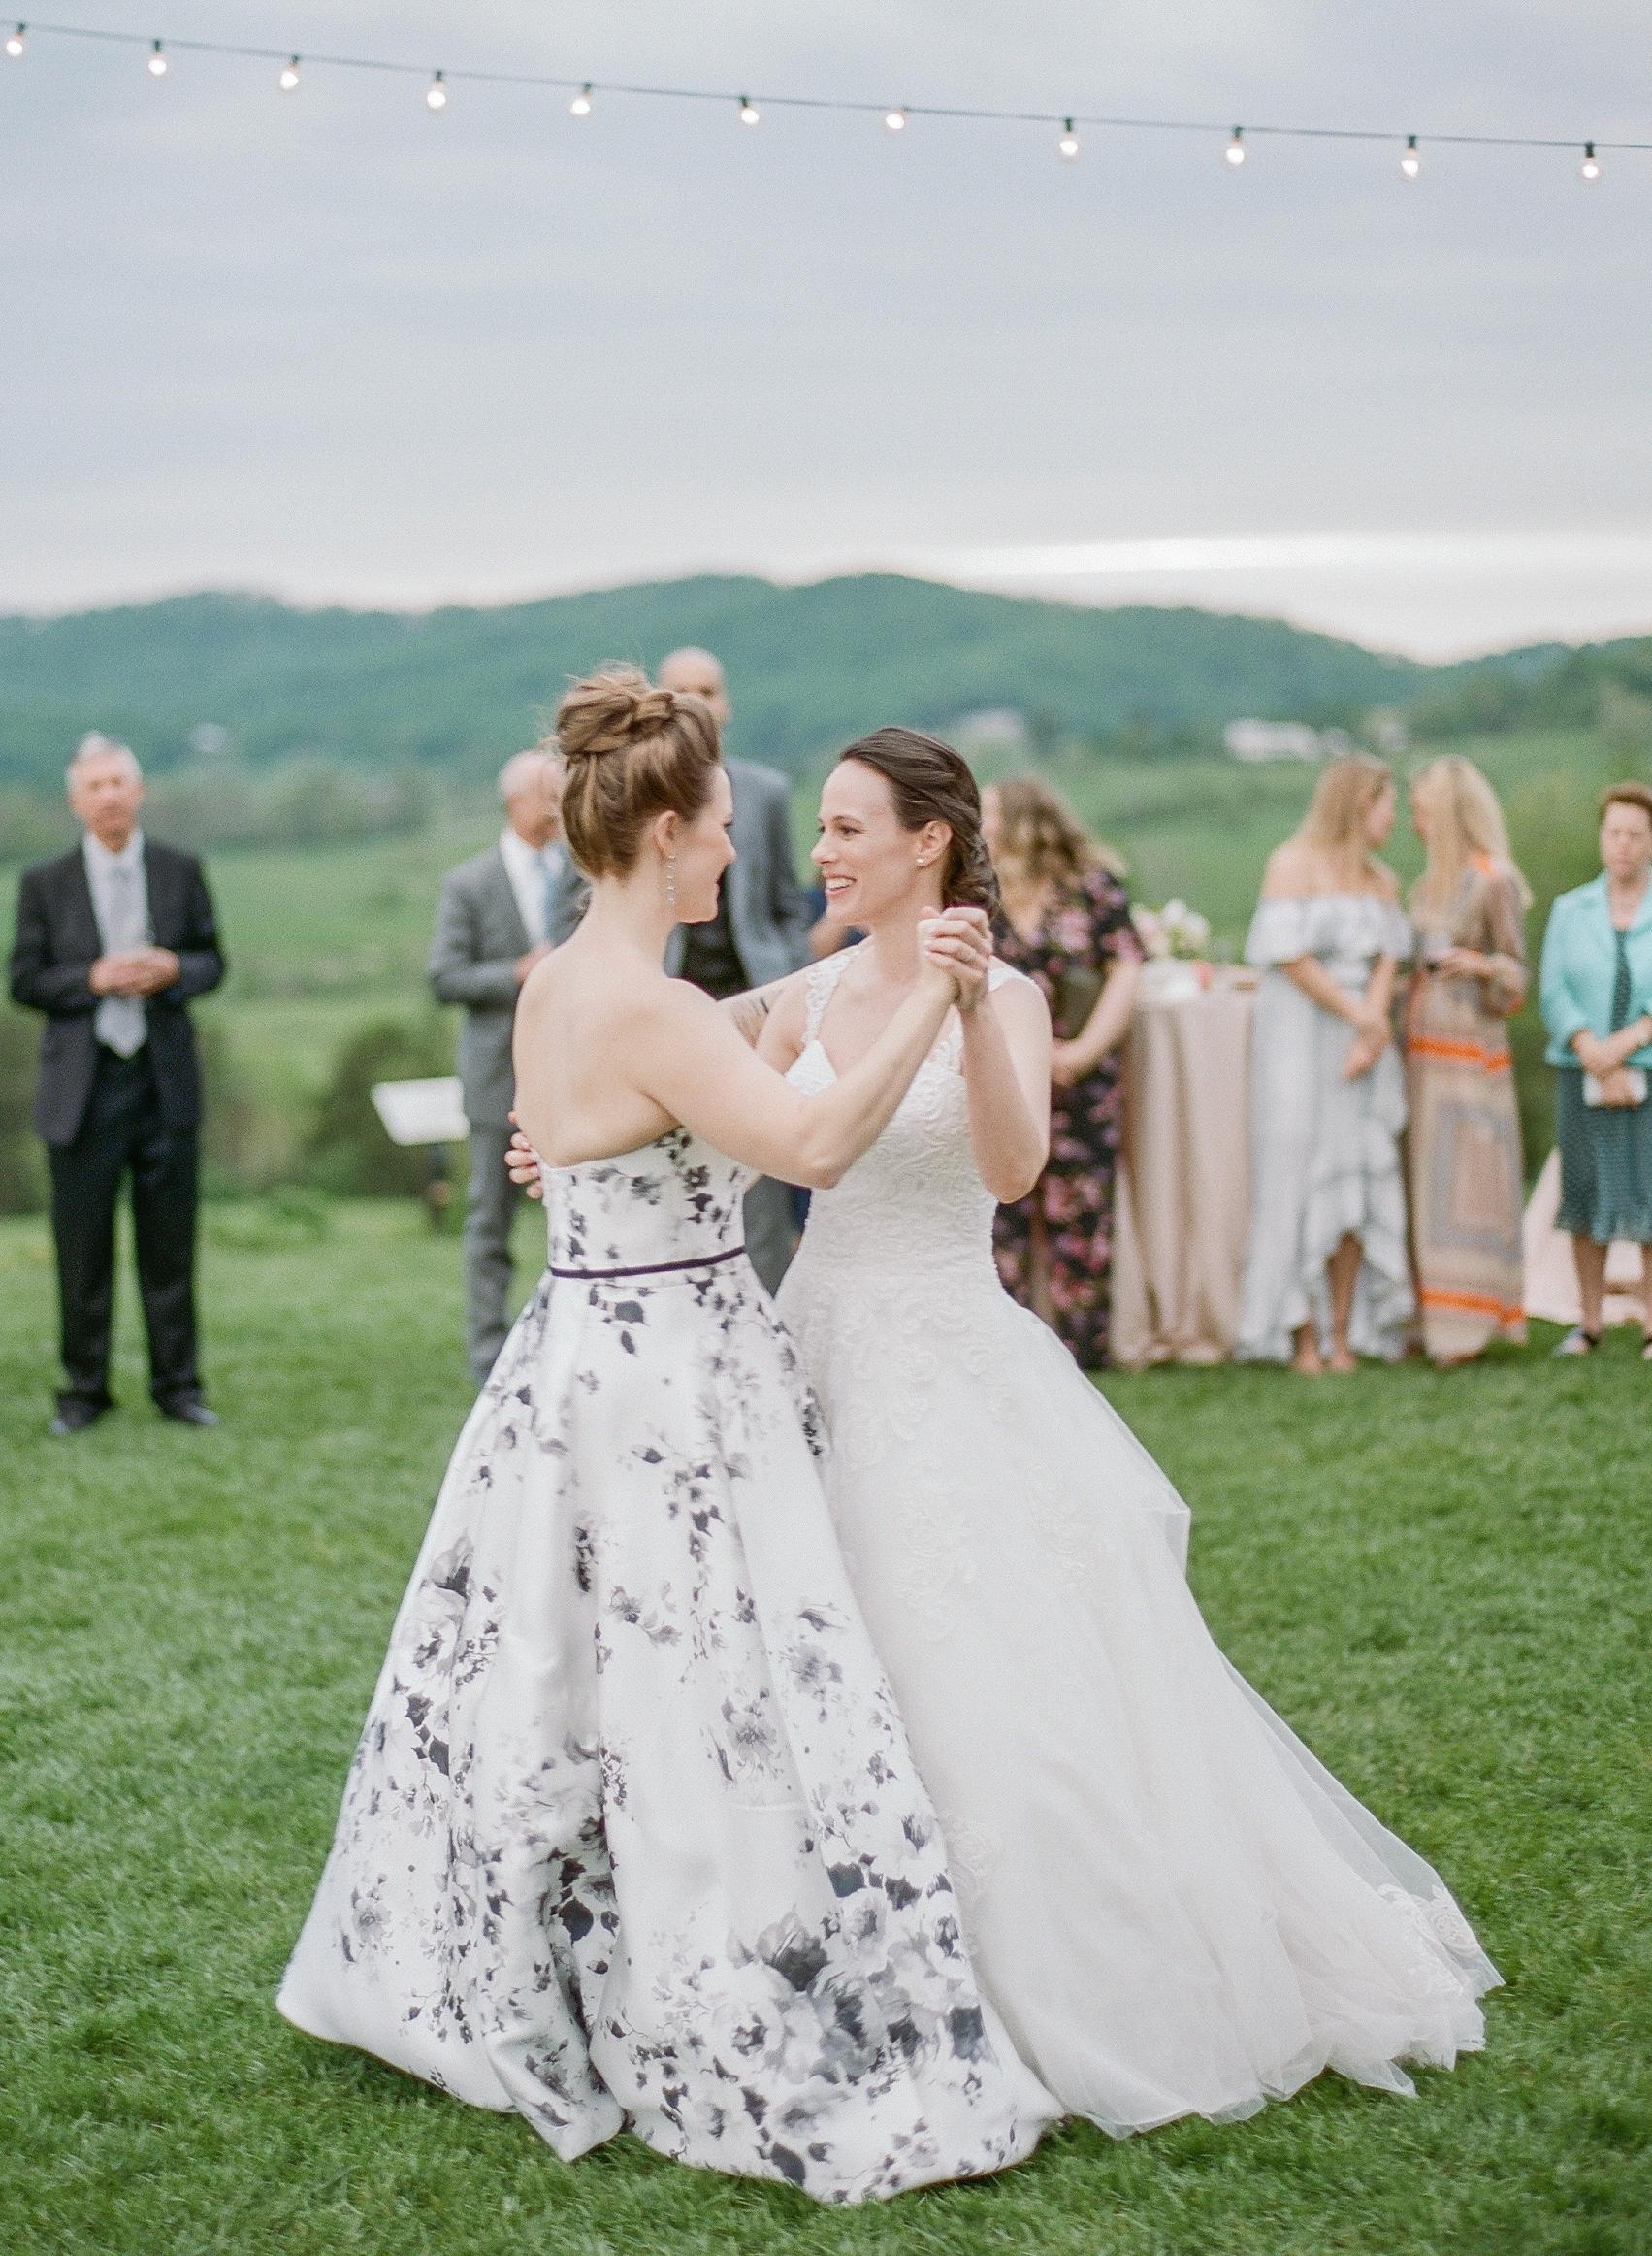 mechelle julia wedding brides couple first dance